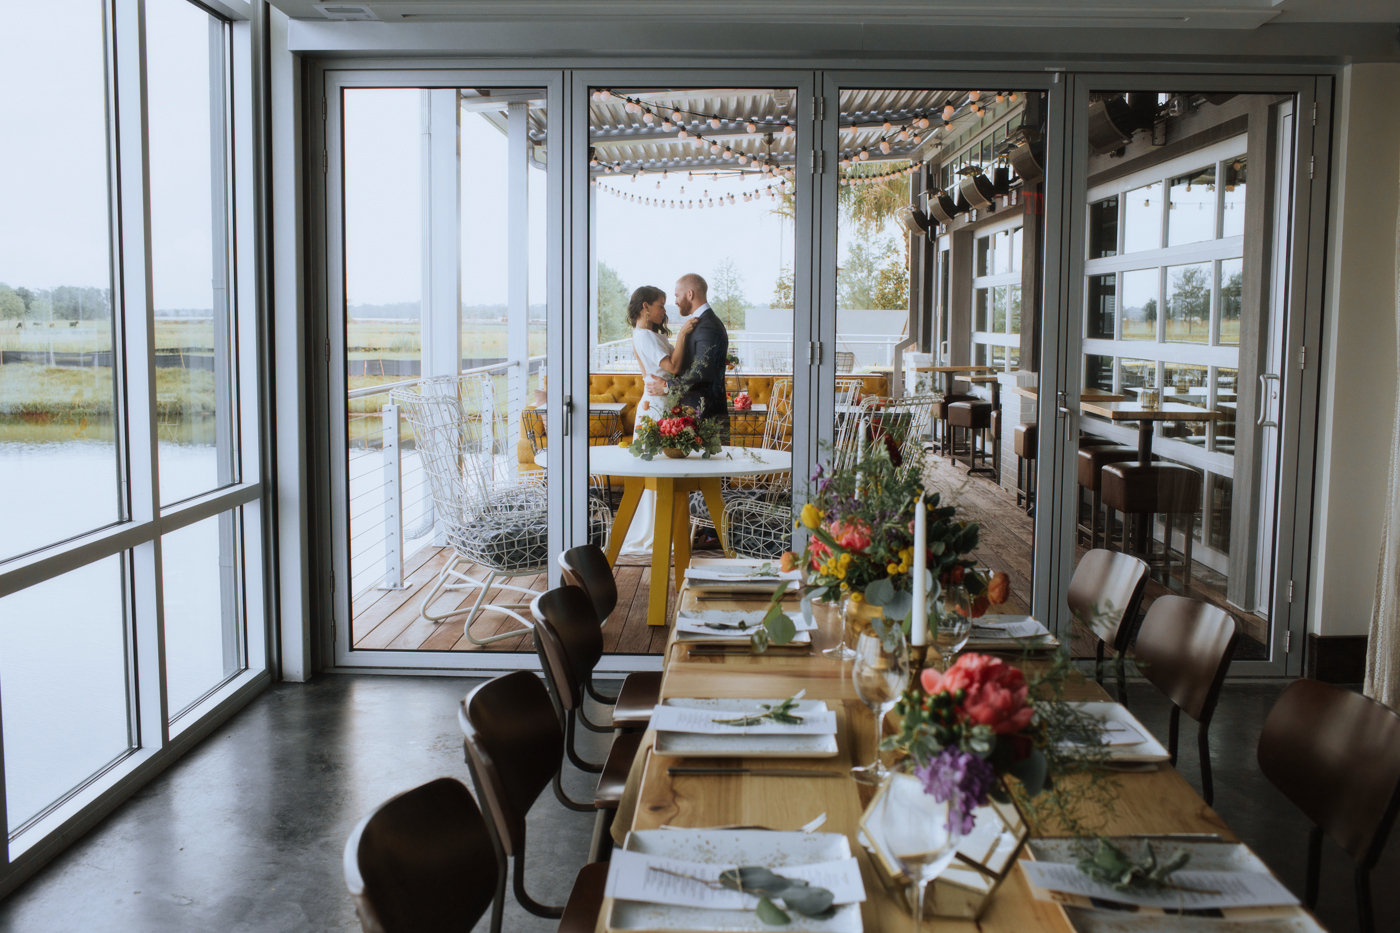 Wedding | Canvas Market | Lake Nona-Orlando, FL  | Vanessa Boy Photography | vanessaboy.com-208.com |Green Wedding Shoes.jpg